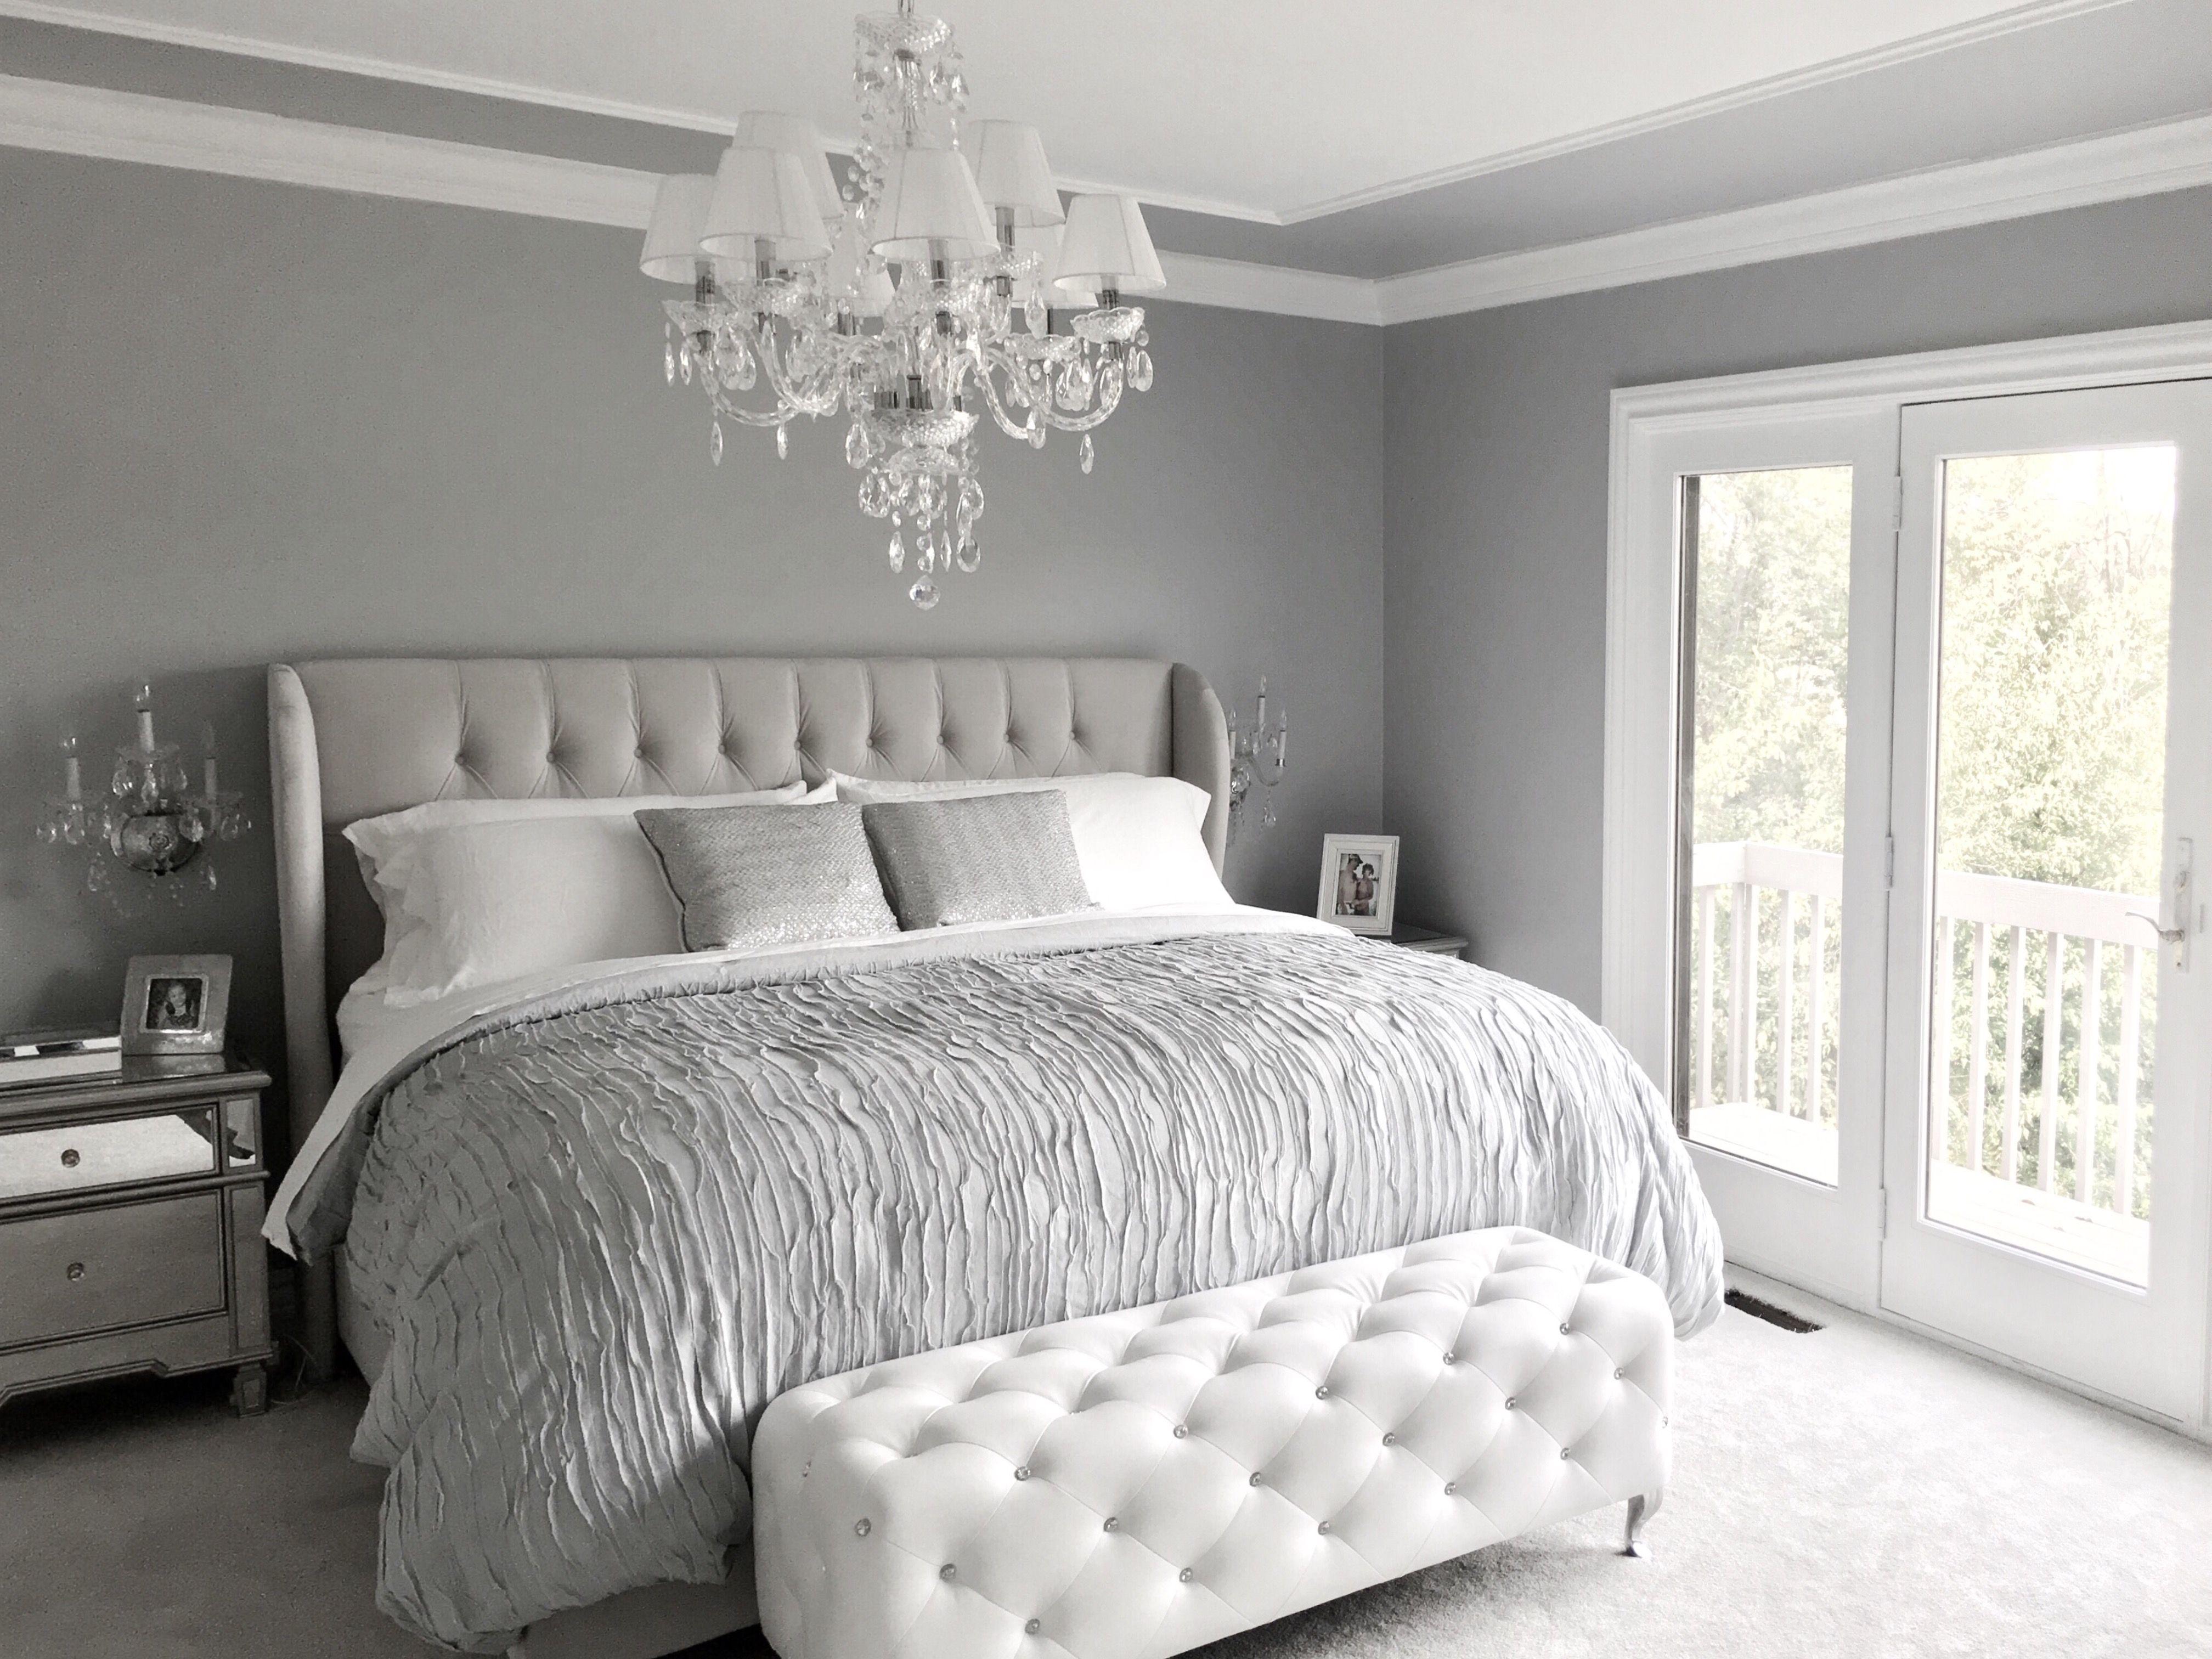 Glamorous Grey Bedroom Decor Grey Tufted Headboard Decoracion